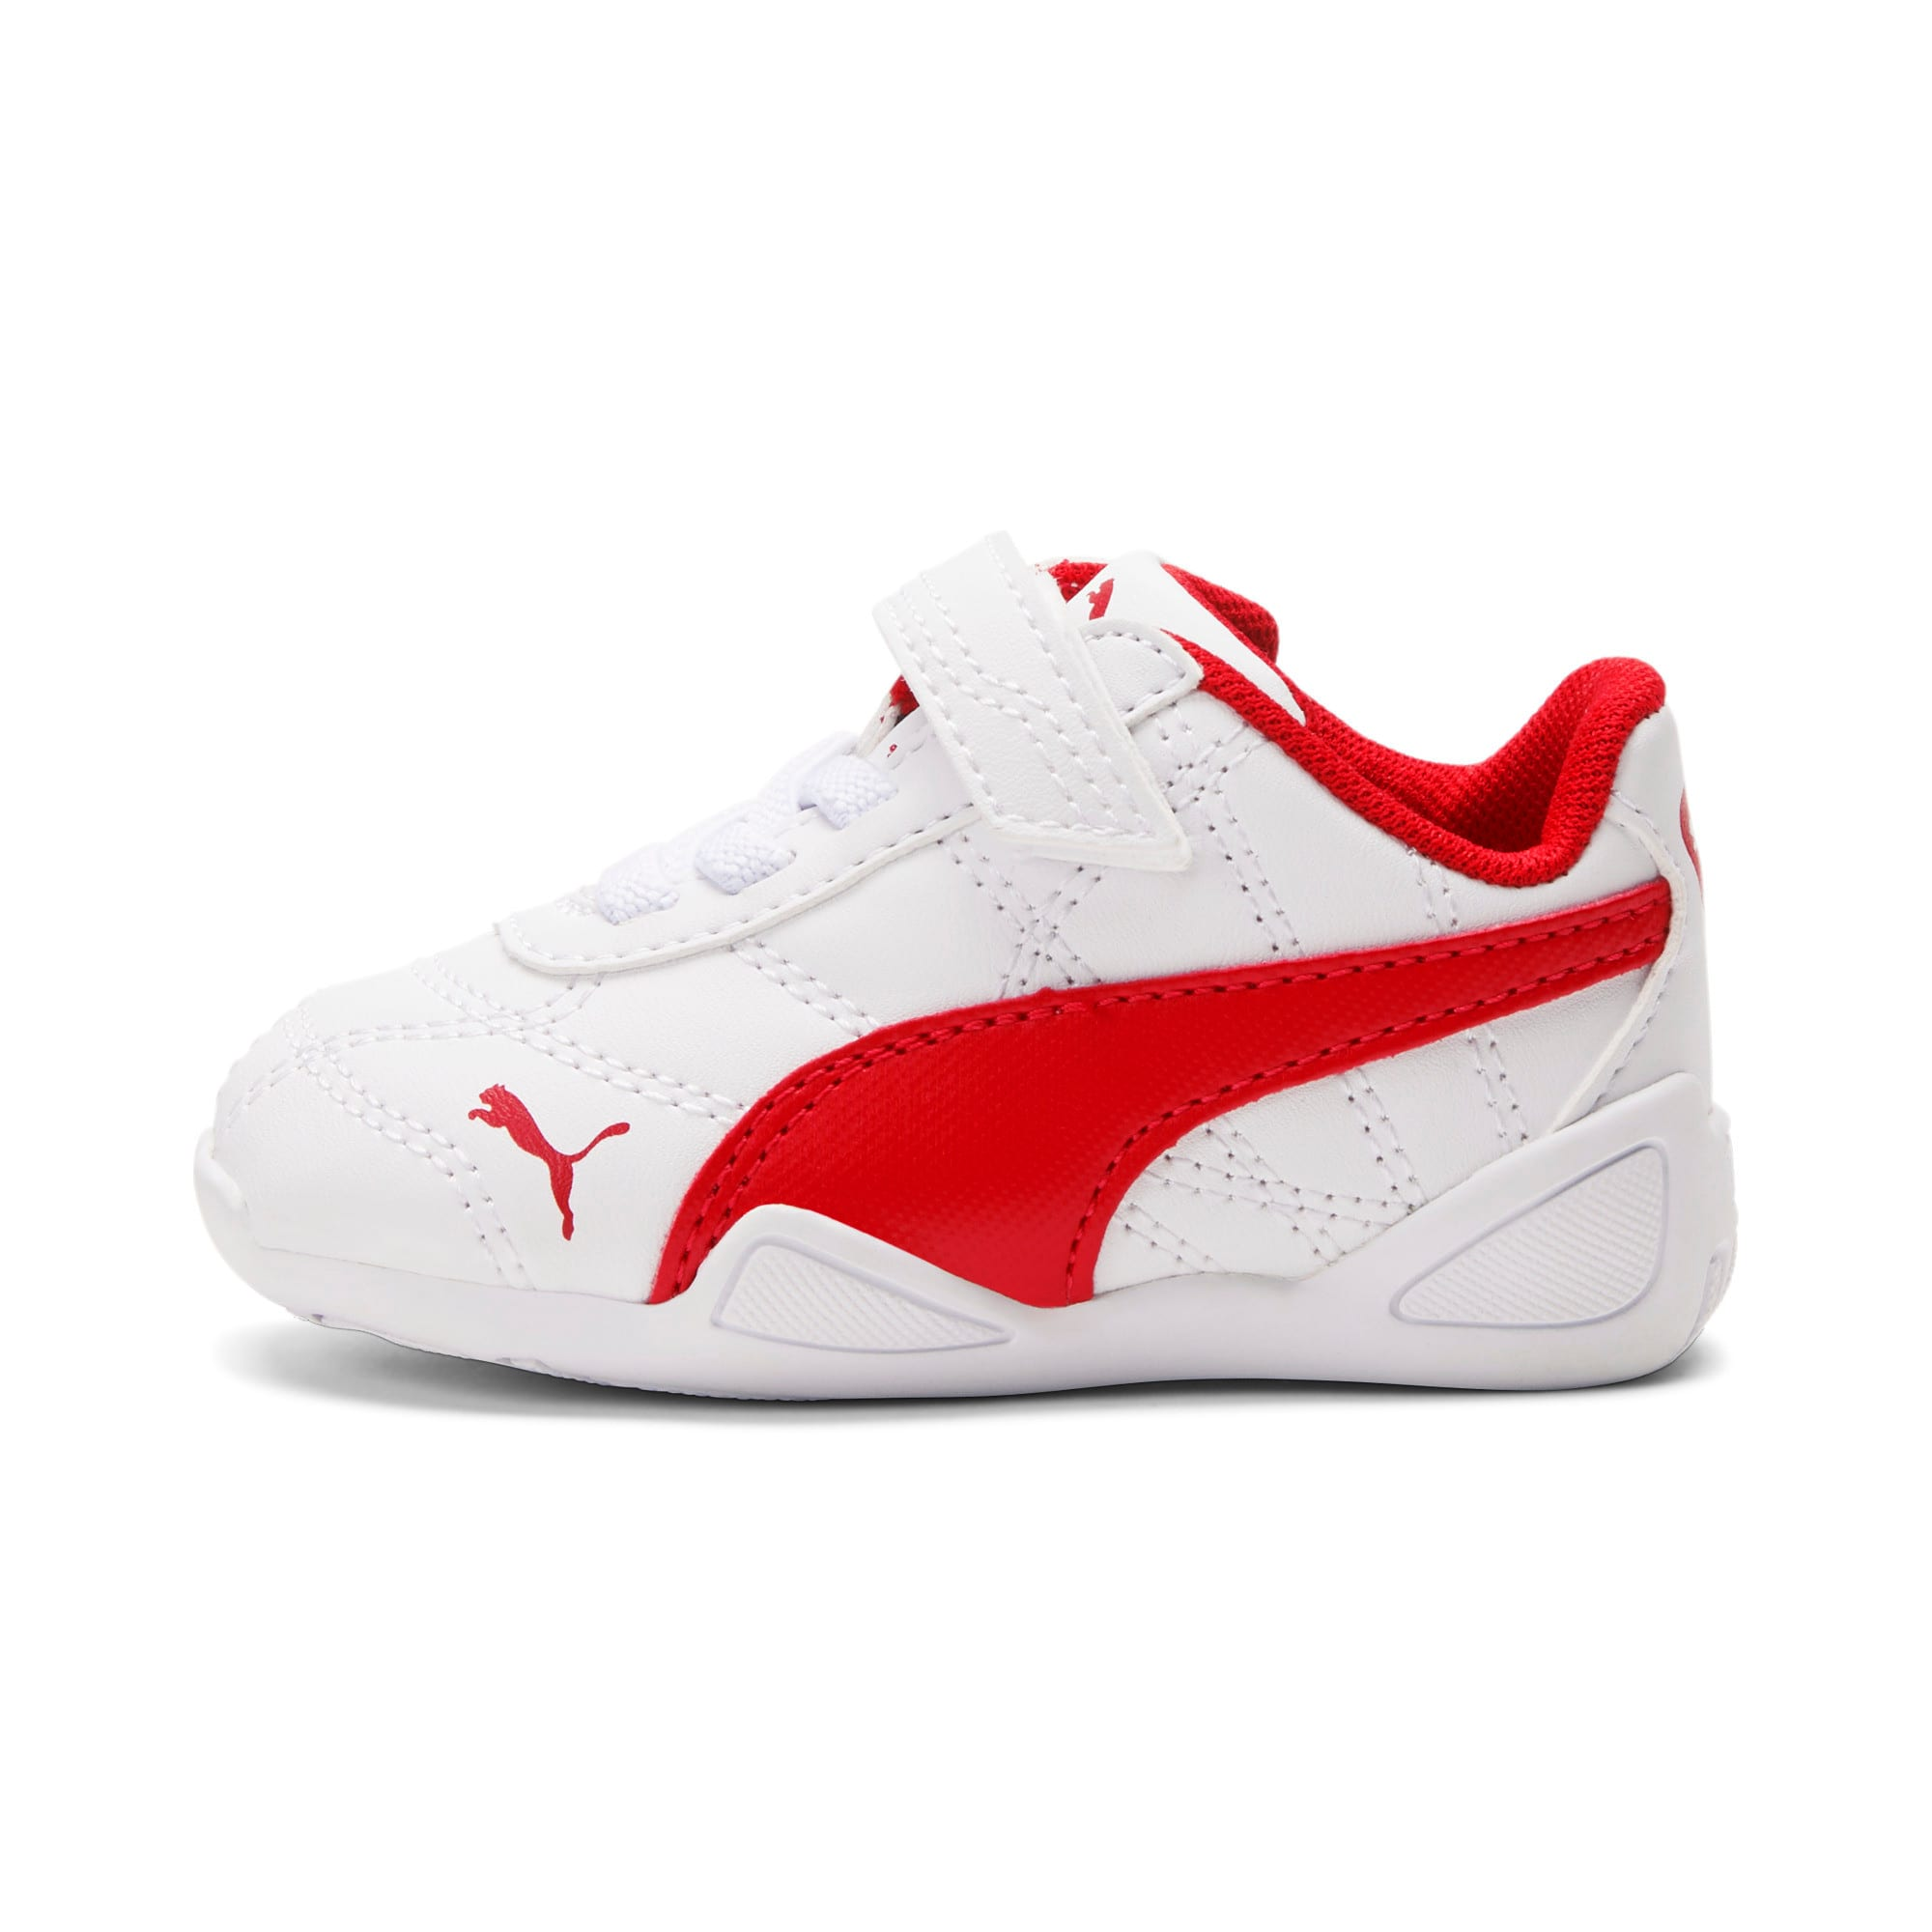 Miniatura 1 de Zapatos Tune Cat3AC para bebés, Puma White-Flame Scarlet, mediano